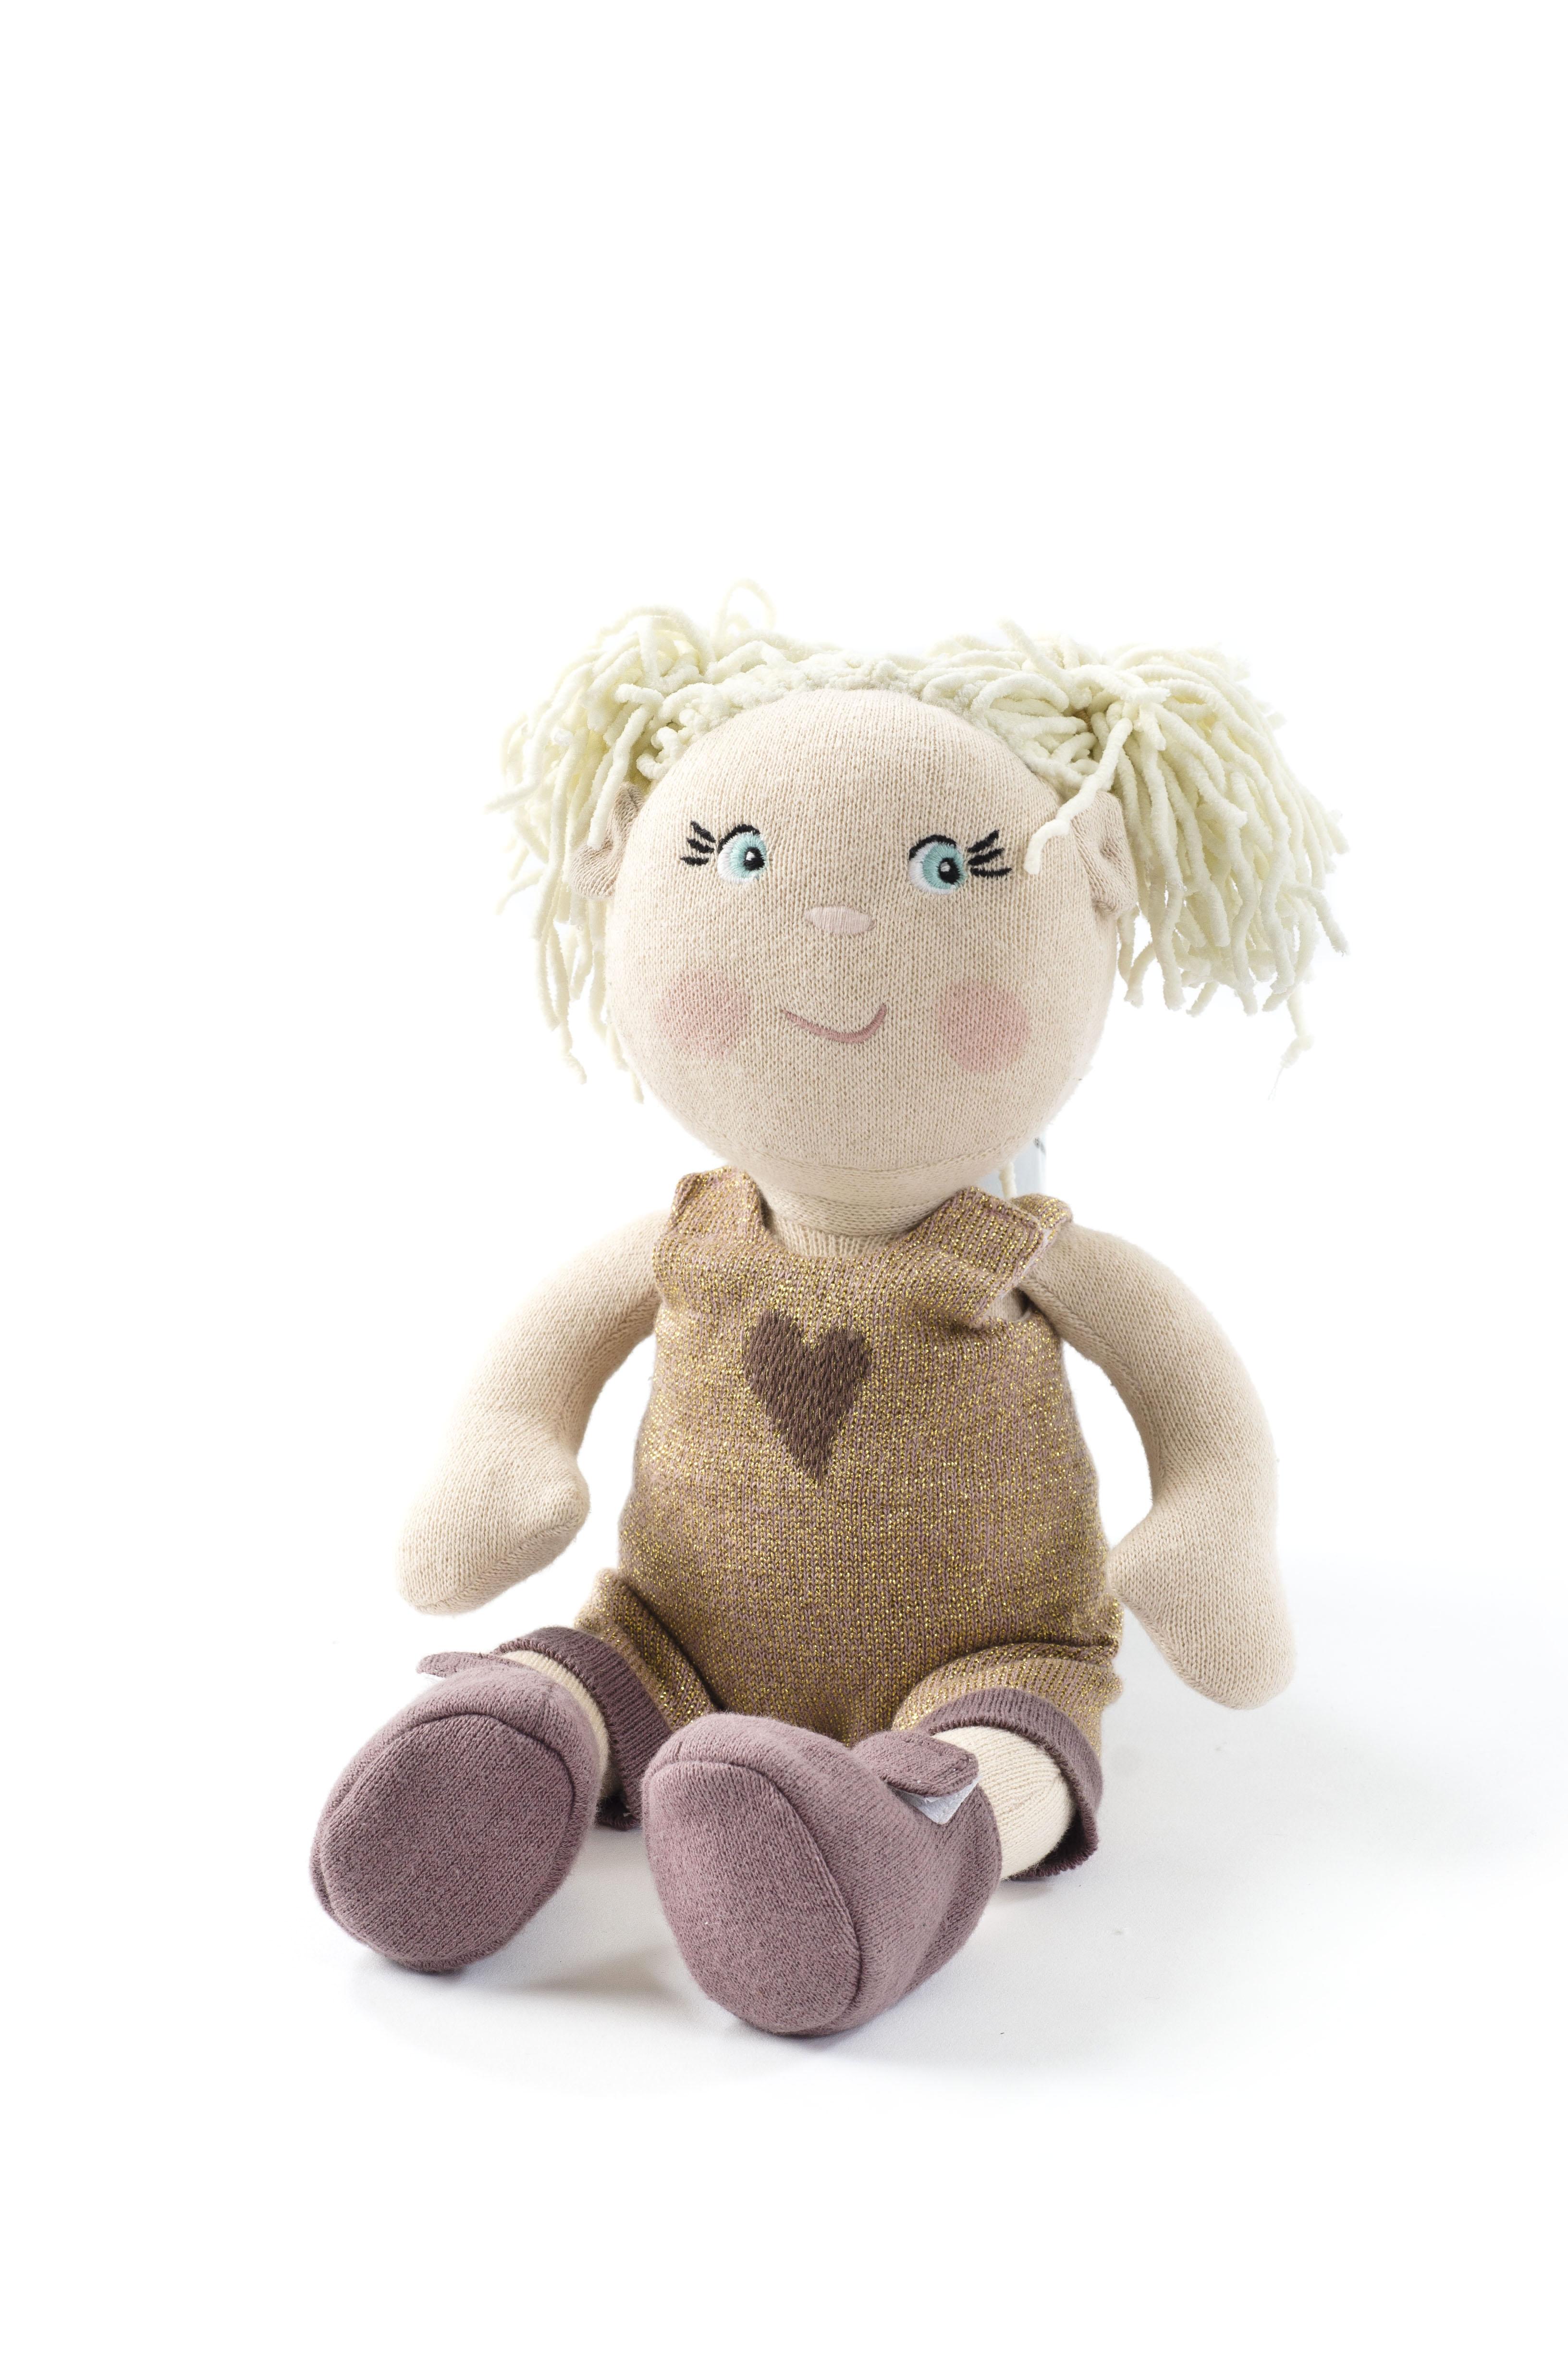 Smallstuff - Knitted Doll 30 cm - Olivia